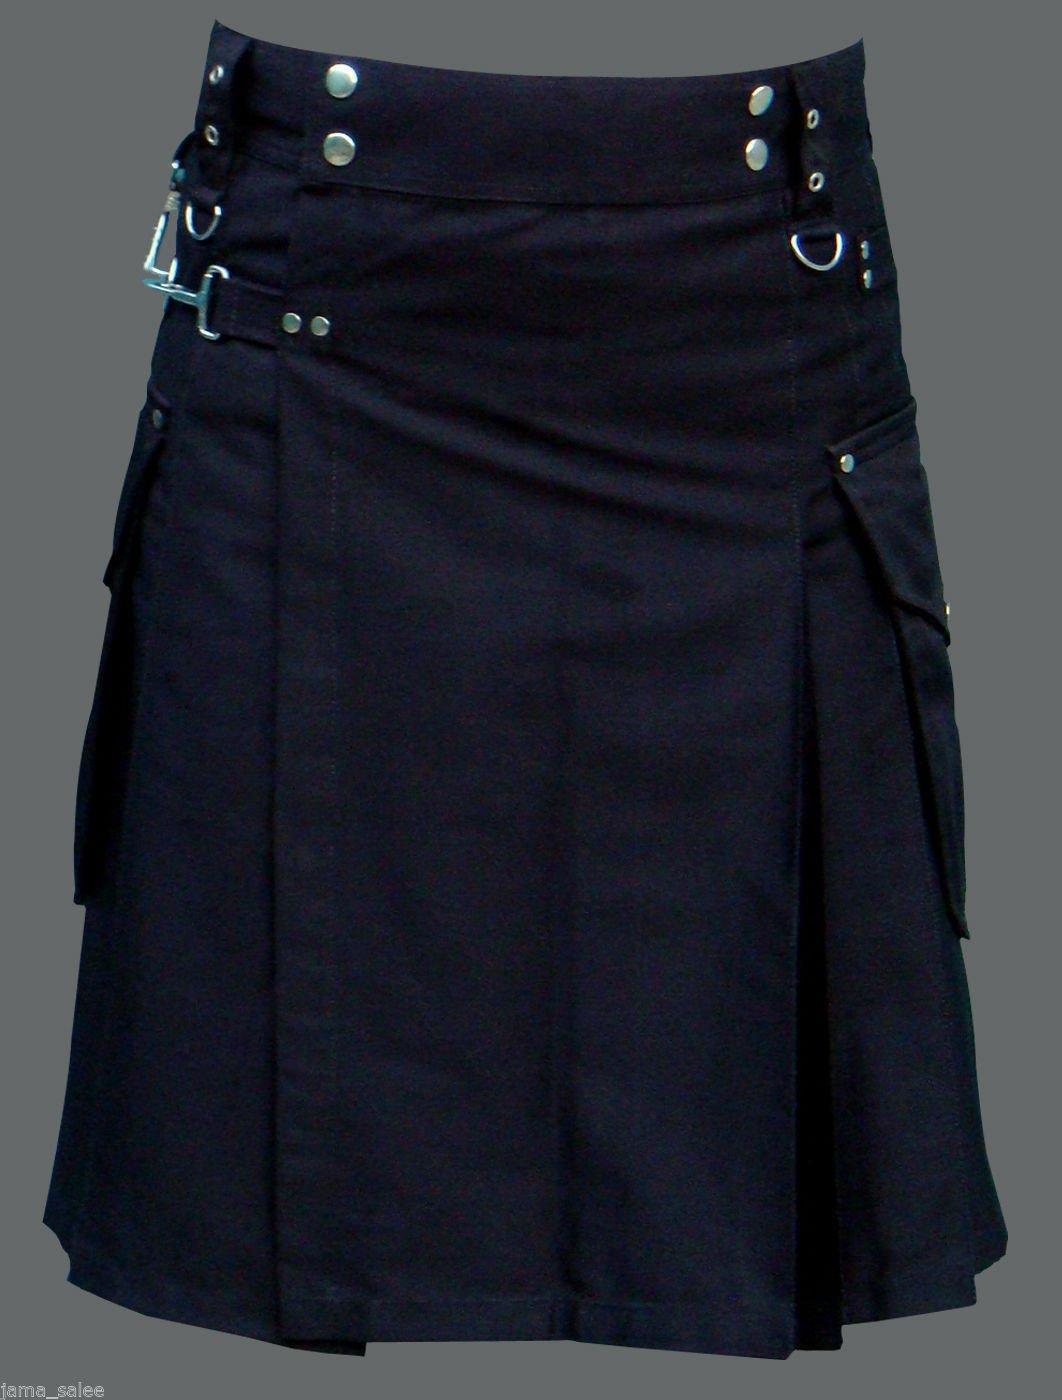 Deluxe Black Cotton Kilt Handmade Utility Gothic Modern Kilt with Cargo Pockets Waist Size 48 to Fit